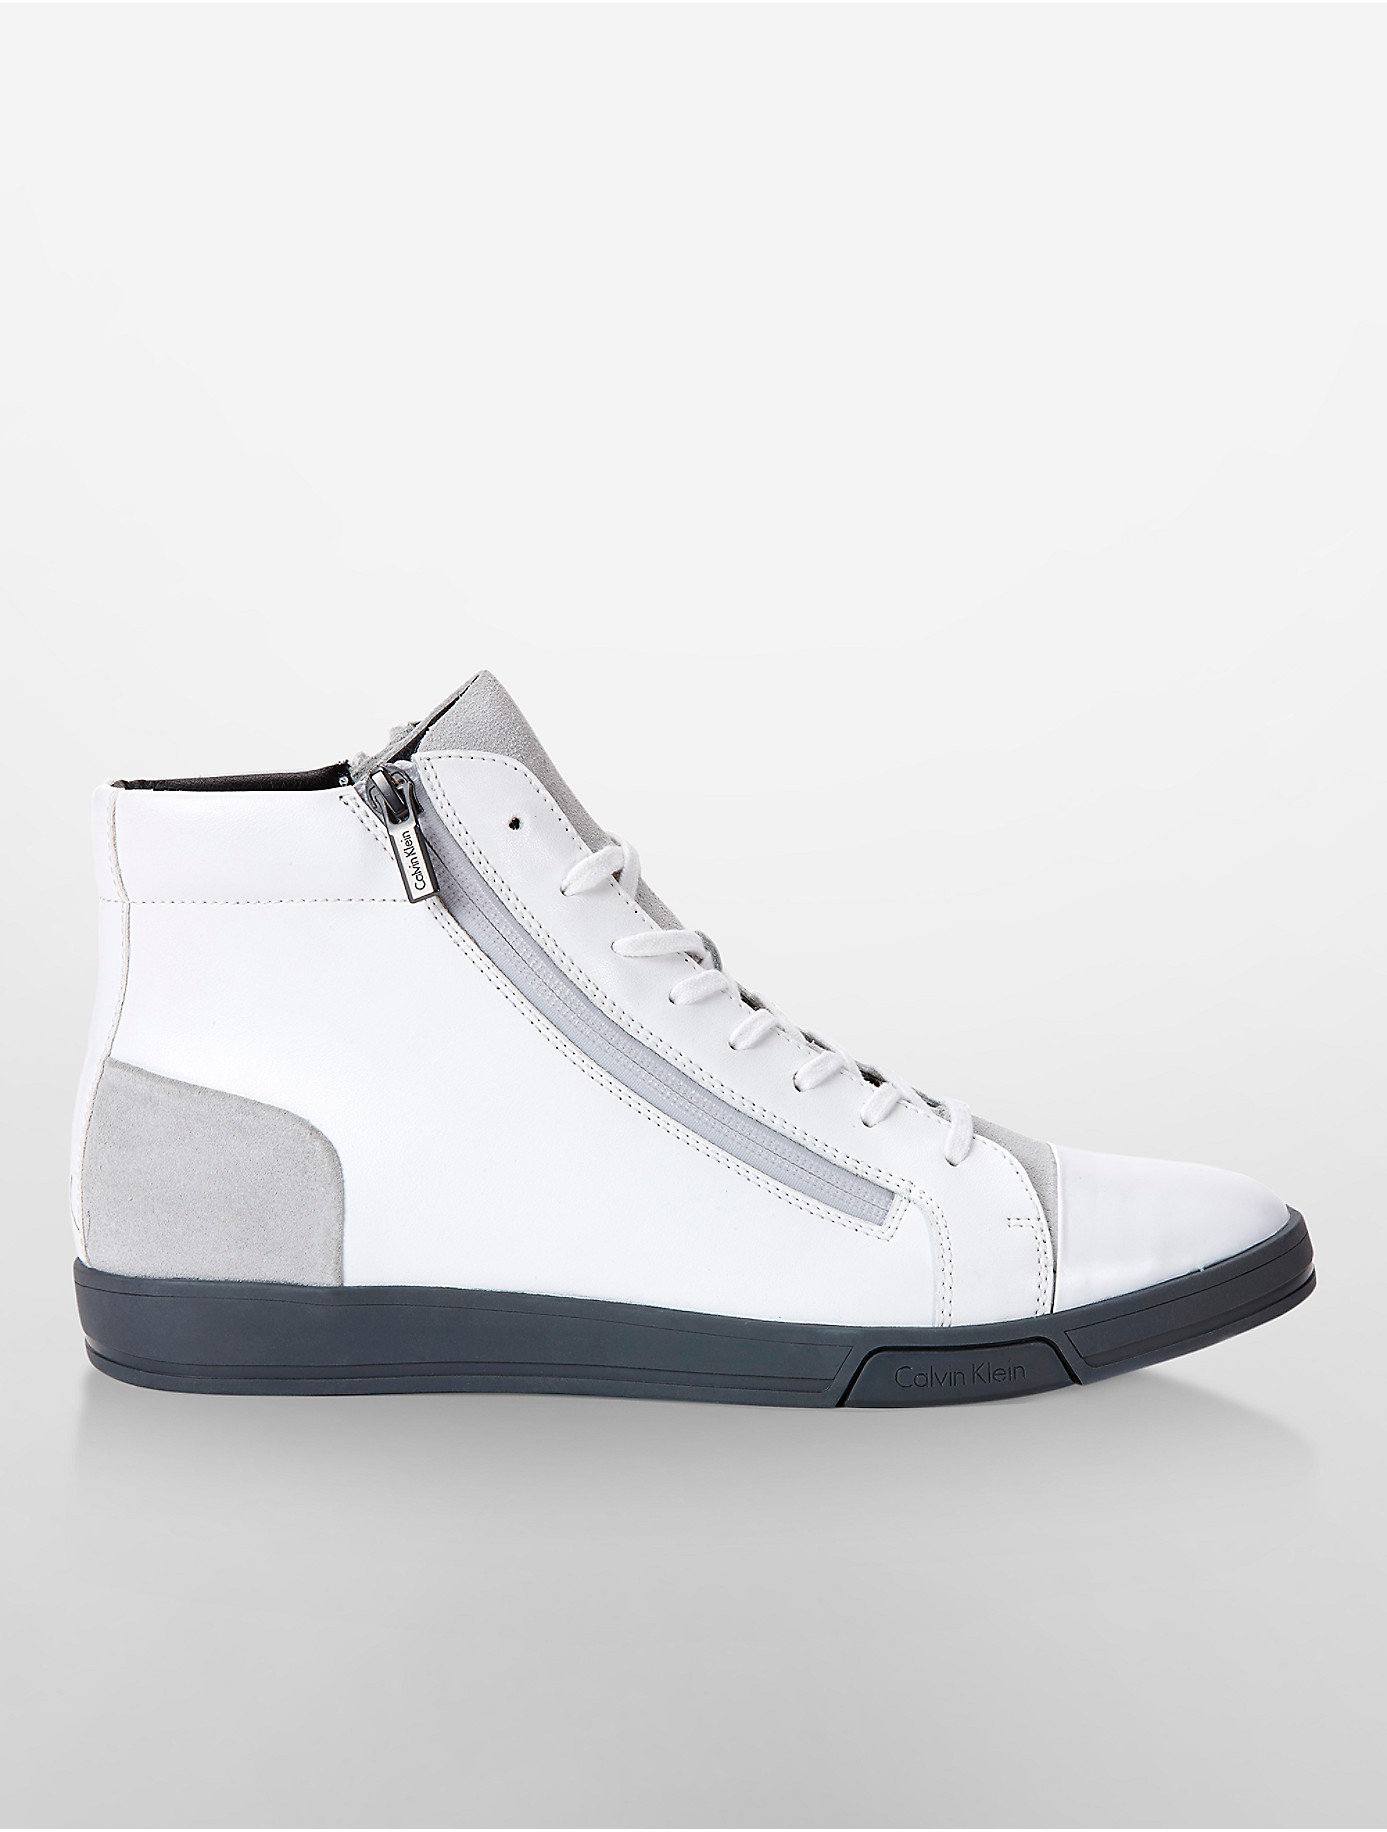 calvin klein white label berke high top sneaker in white lyst. Black Bedroom Furniture Sets. Home Design Ideas